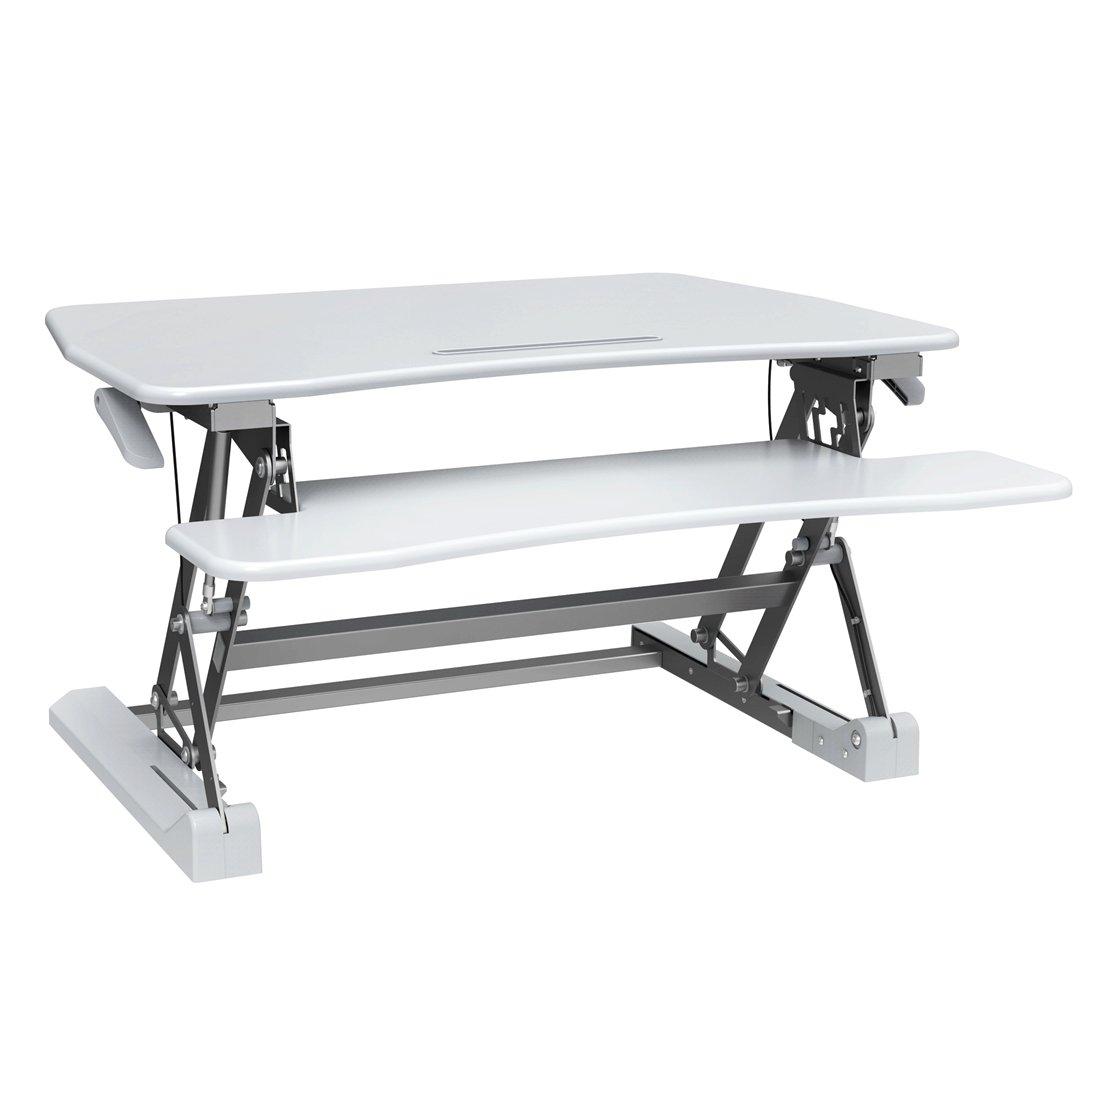 Good Life Height Adjustable Standing Desk 35'' Wide Platform Vertical Converter Riser Stand up Sit Stand Desk Monitor Stand Computer Table White ELC389